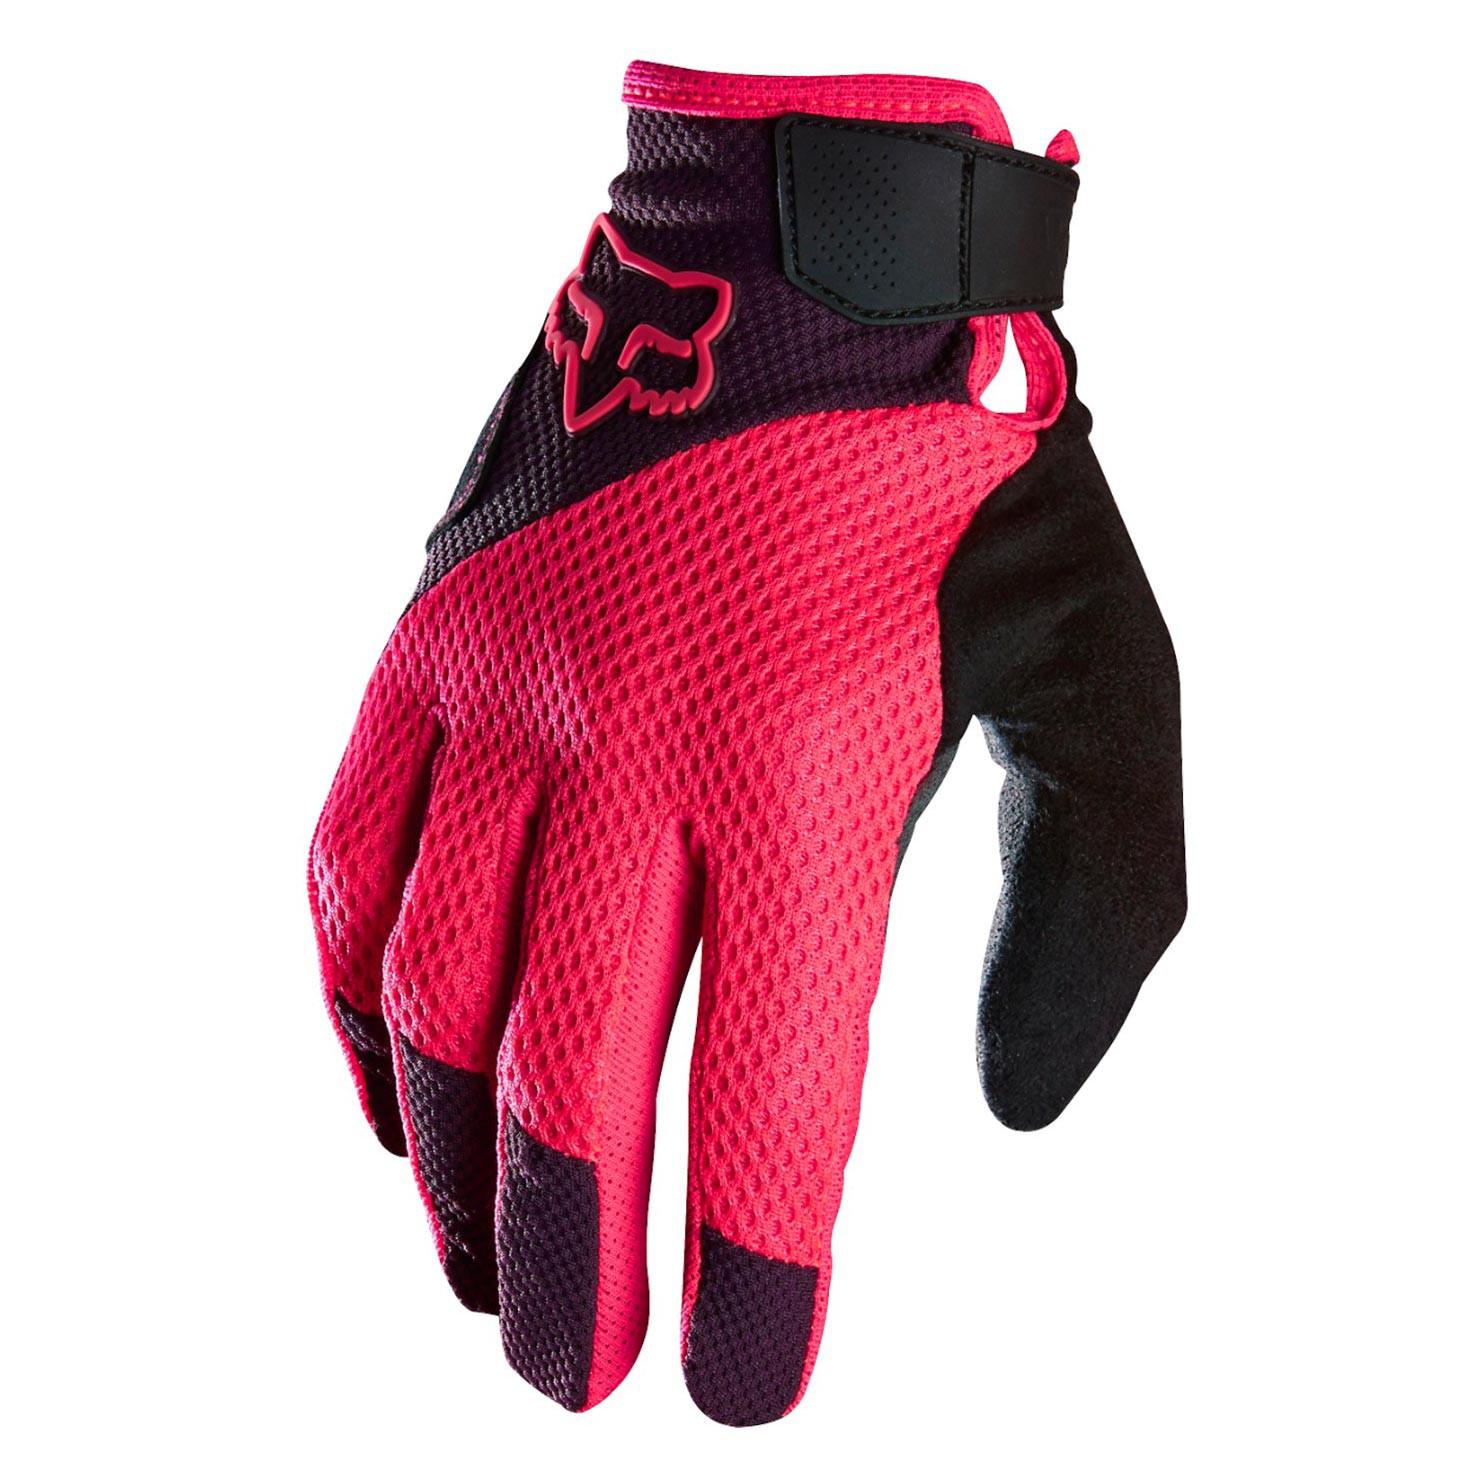 Bike rukavice Fox Wms Reflex Gel plum